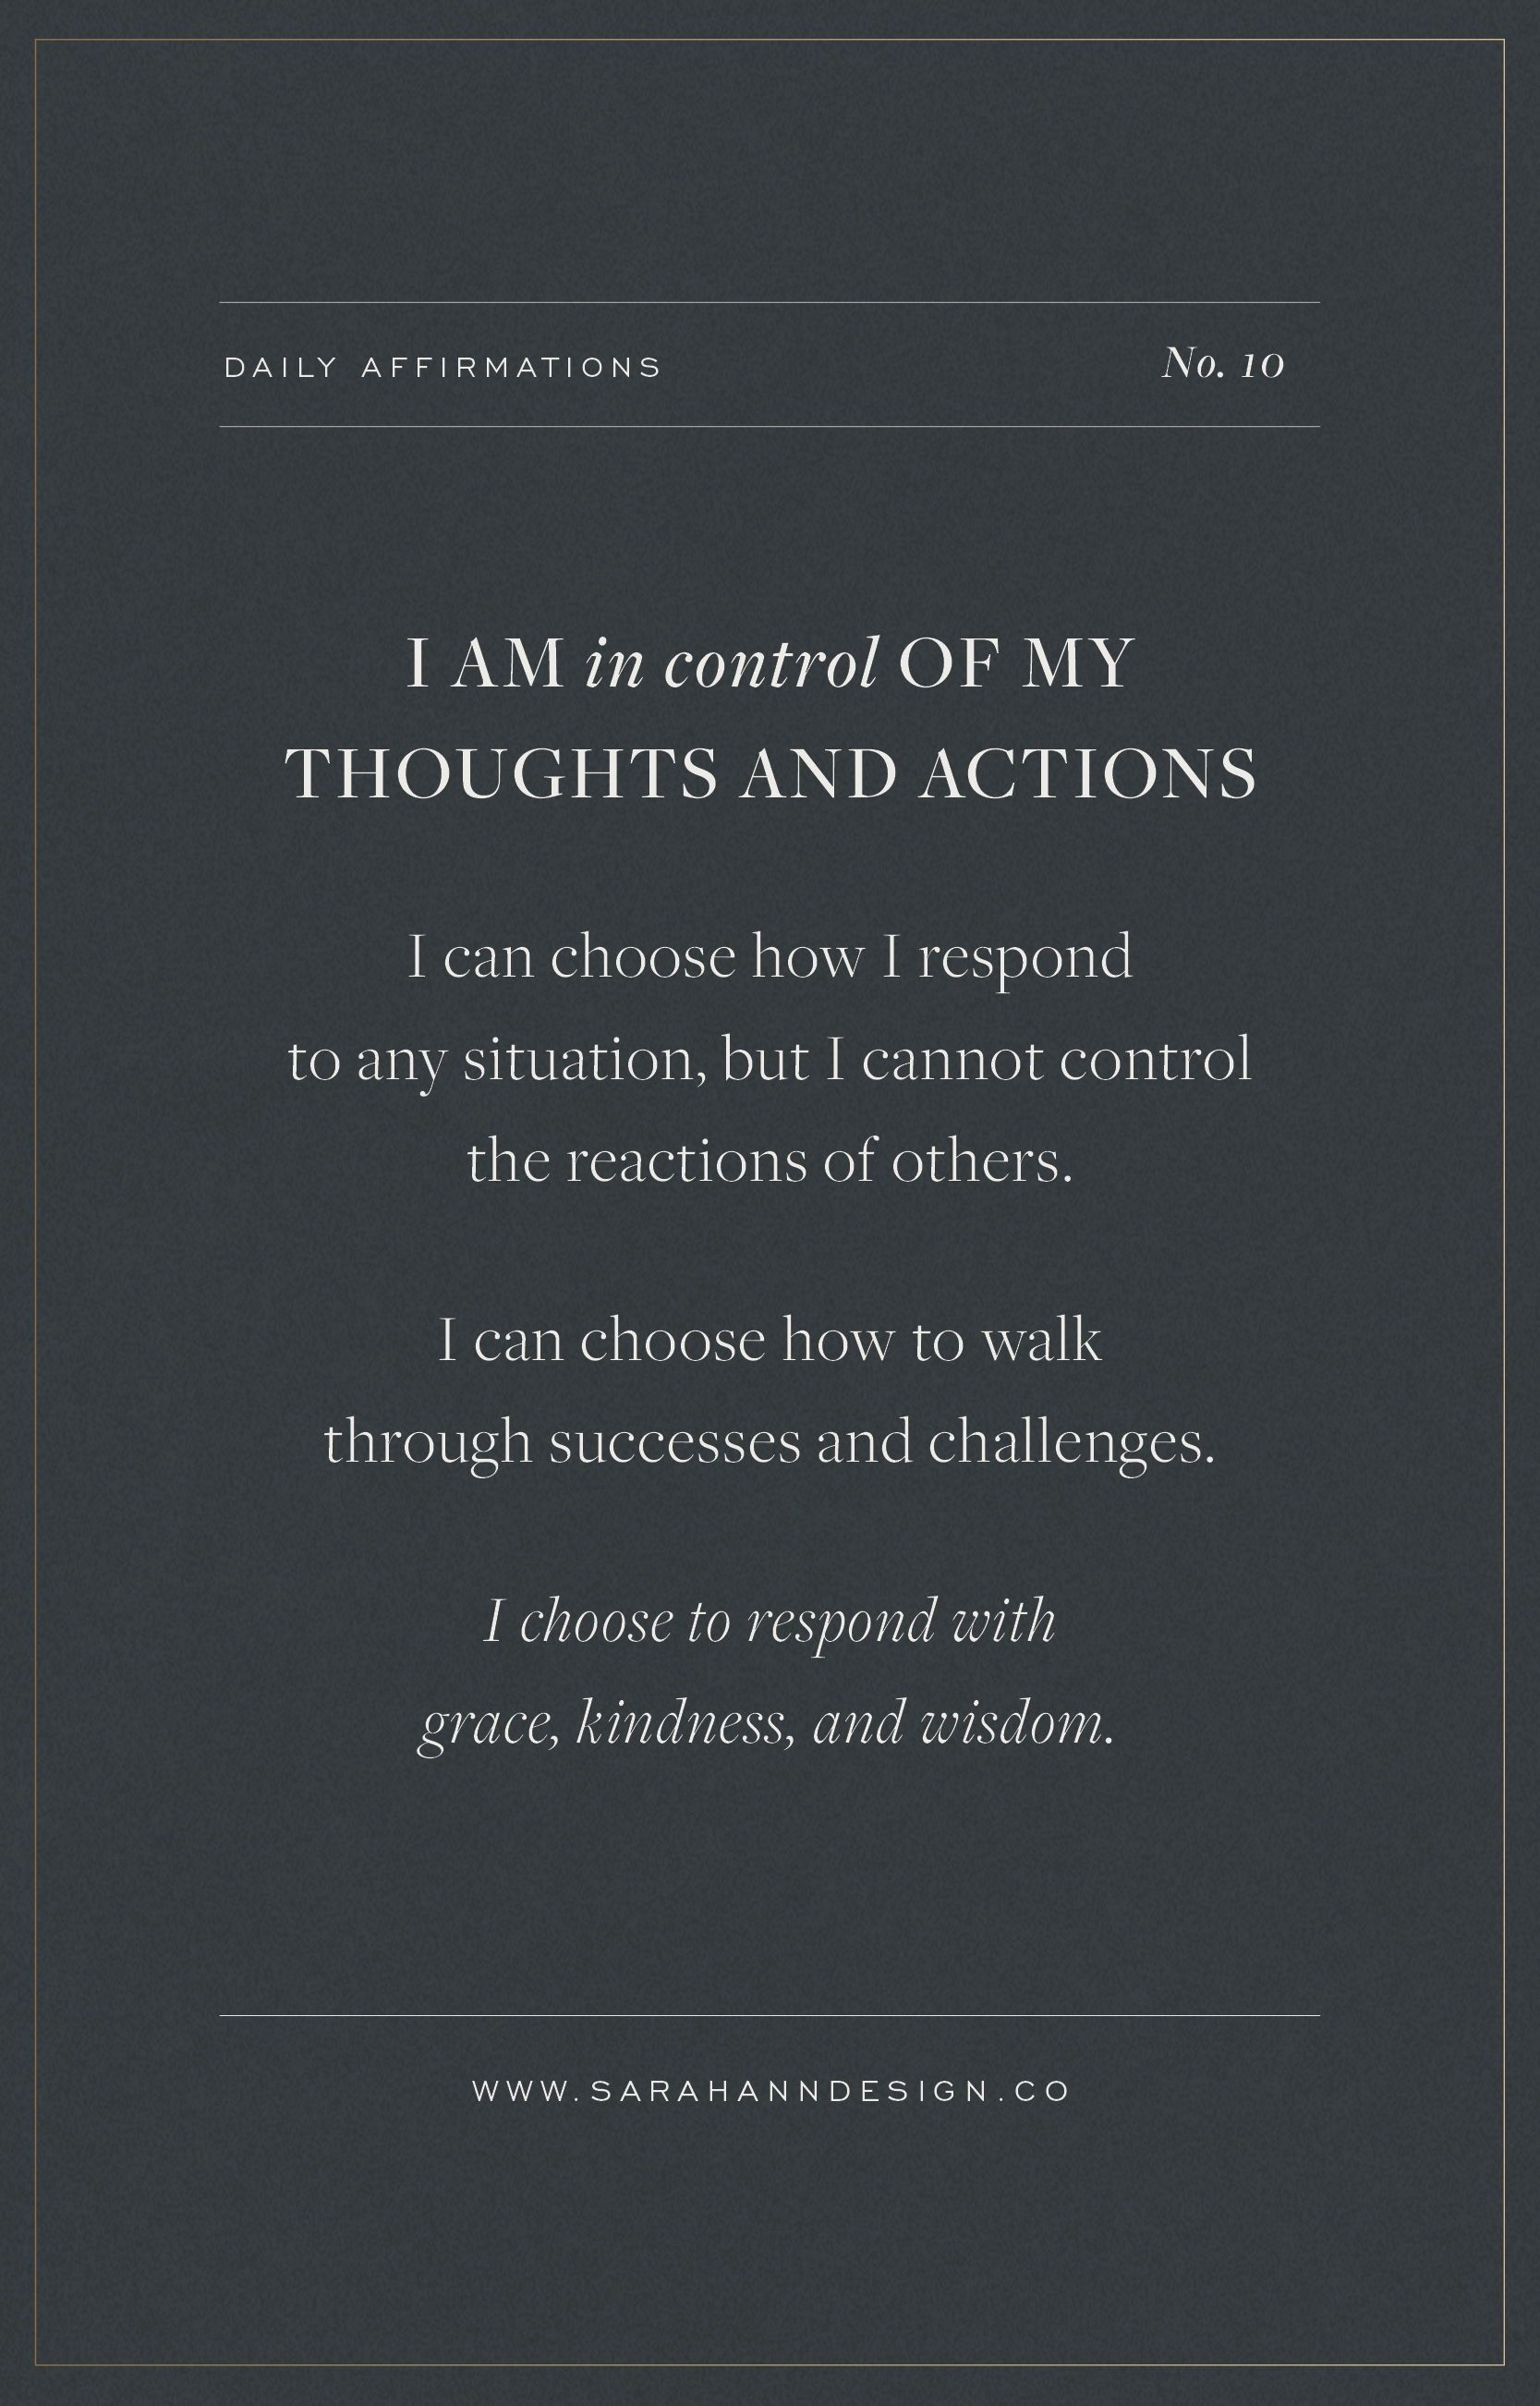 23 Daily Affirmations for Creatives | Sarah Ann Design